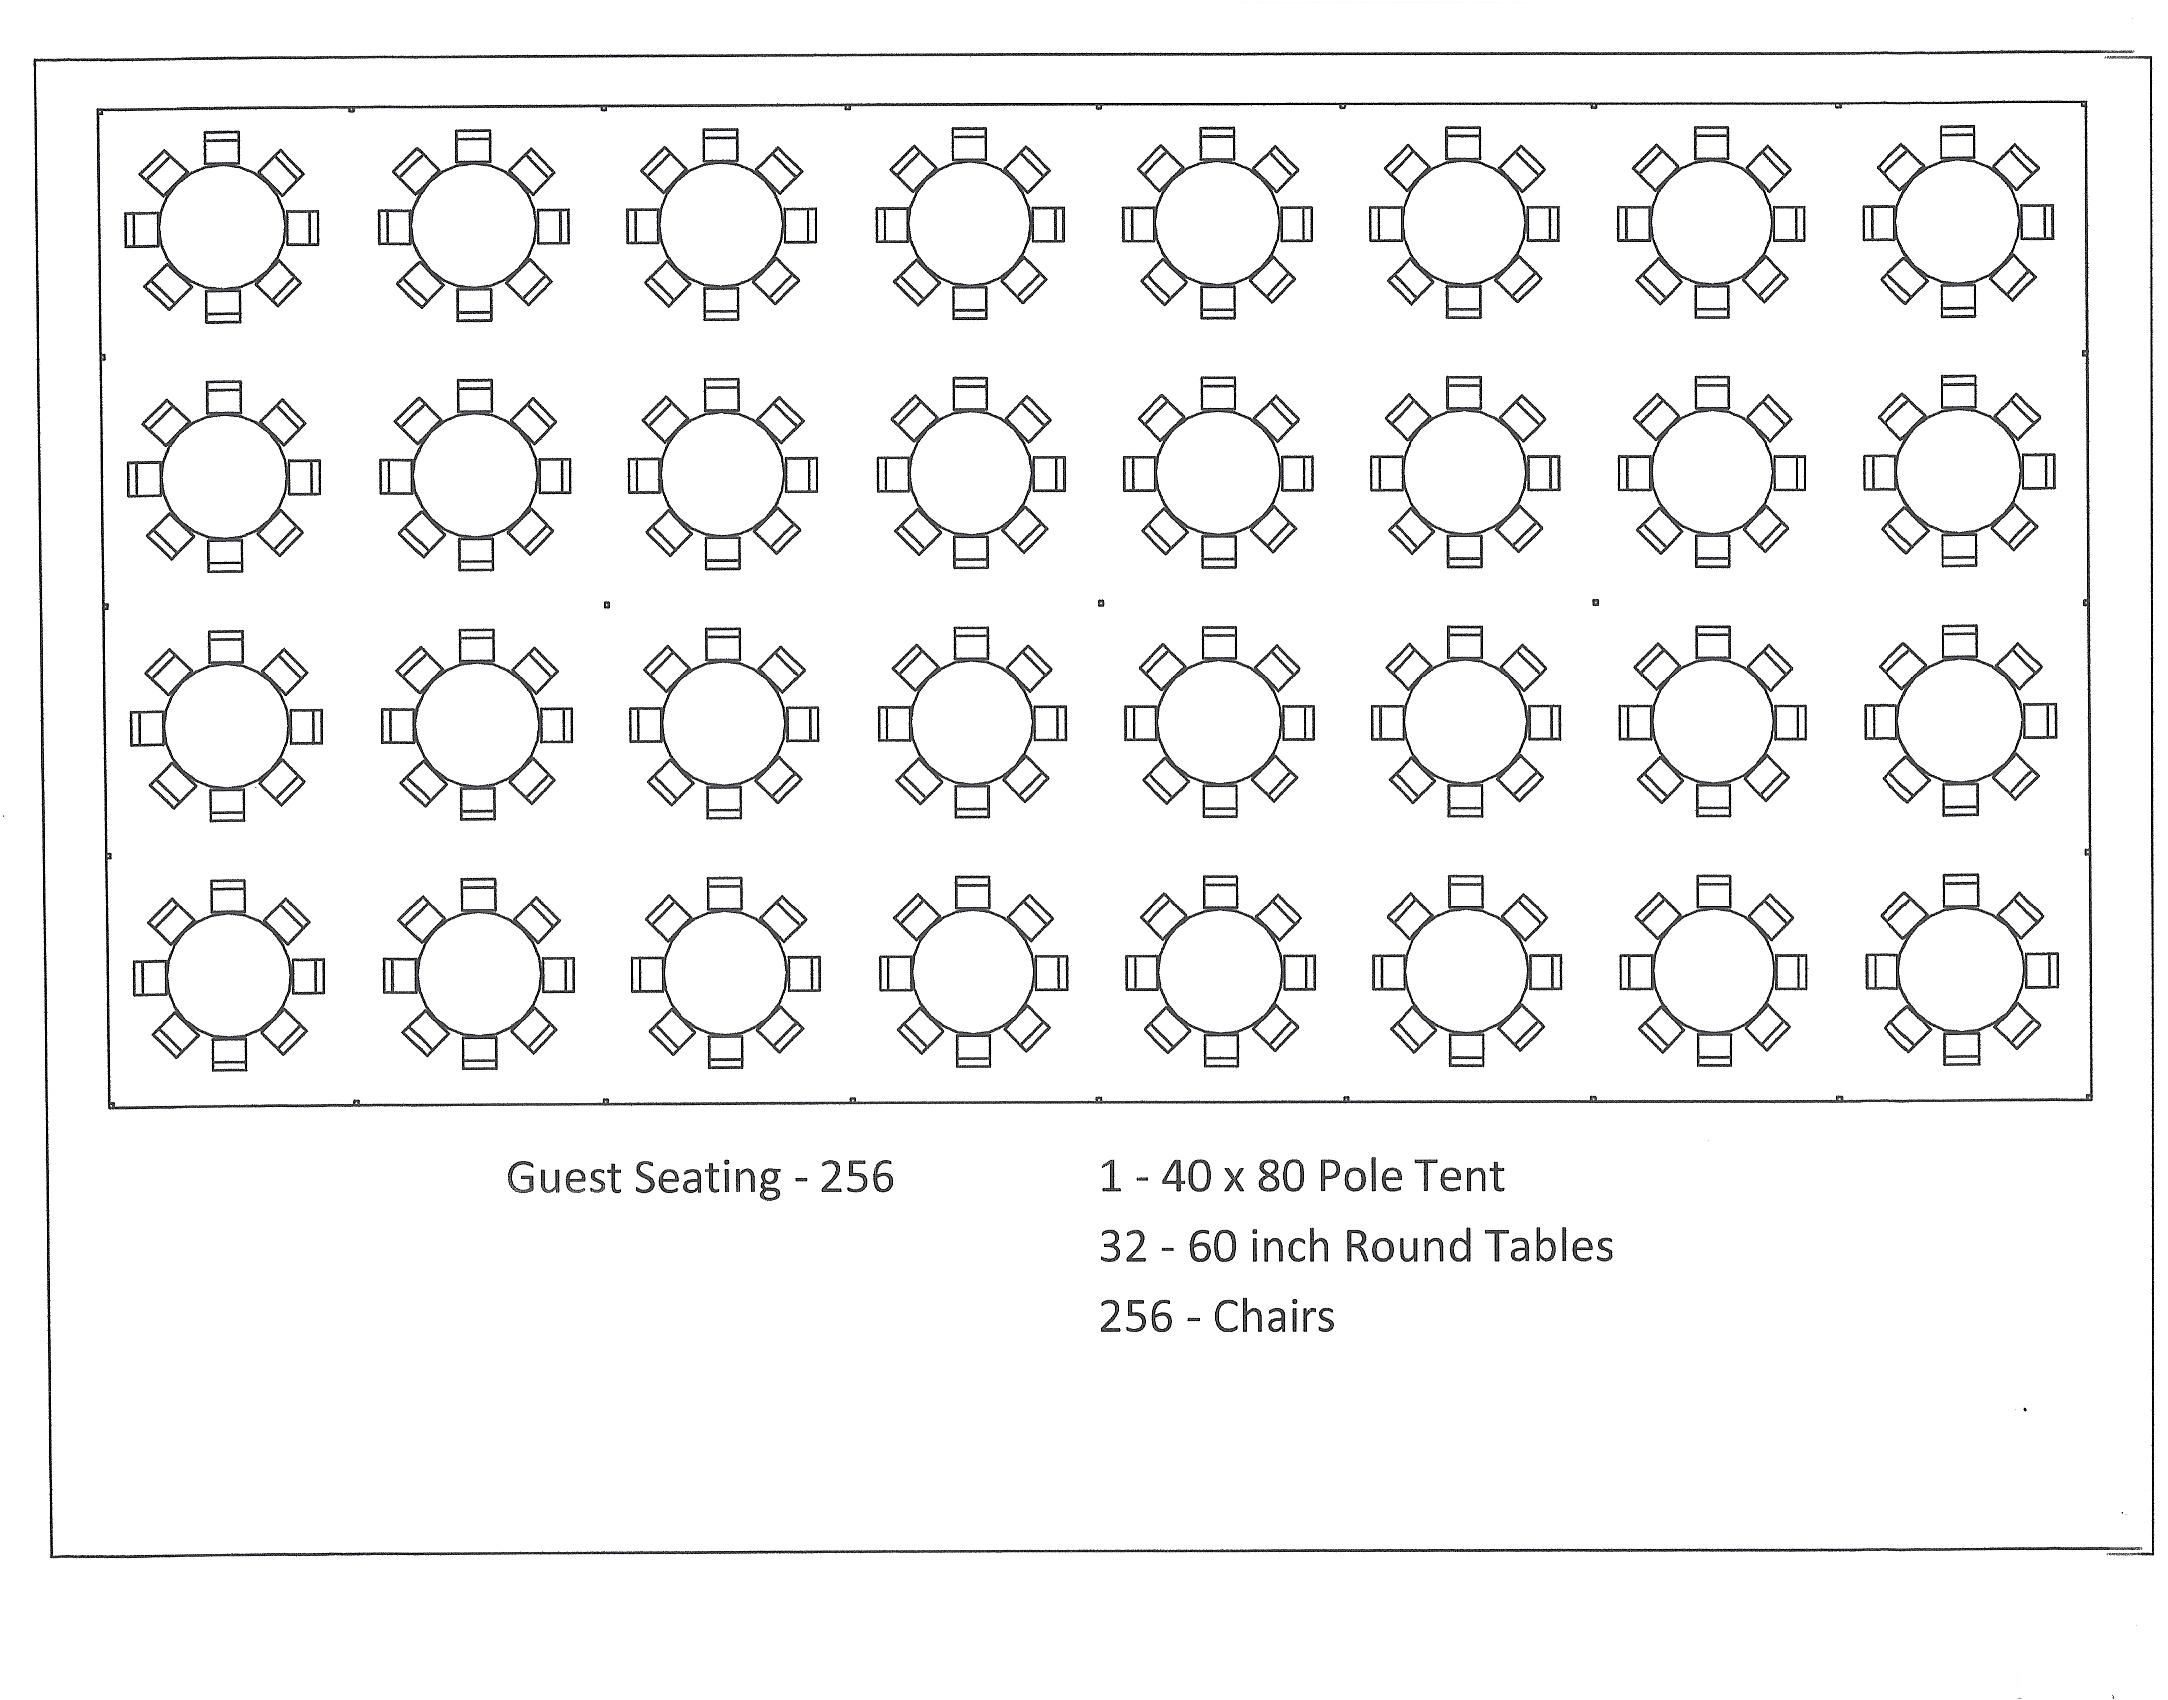 sc 1 st  Canton Canopies & 40 x 80 Pole Tent Seating Arrangements